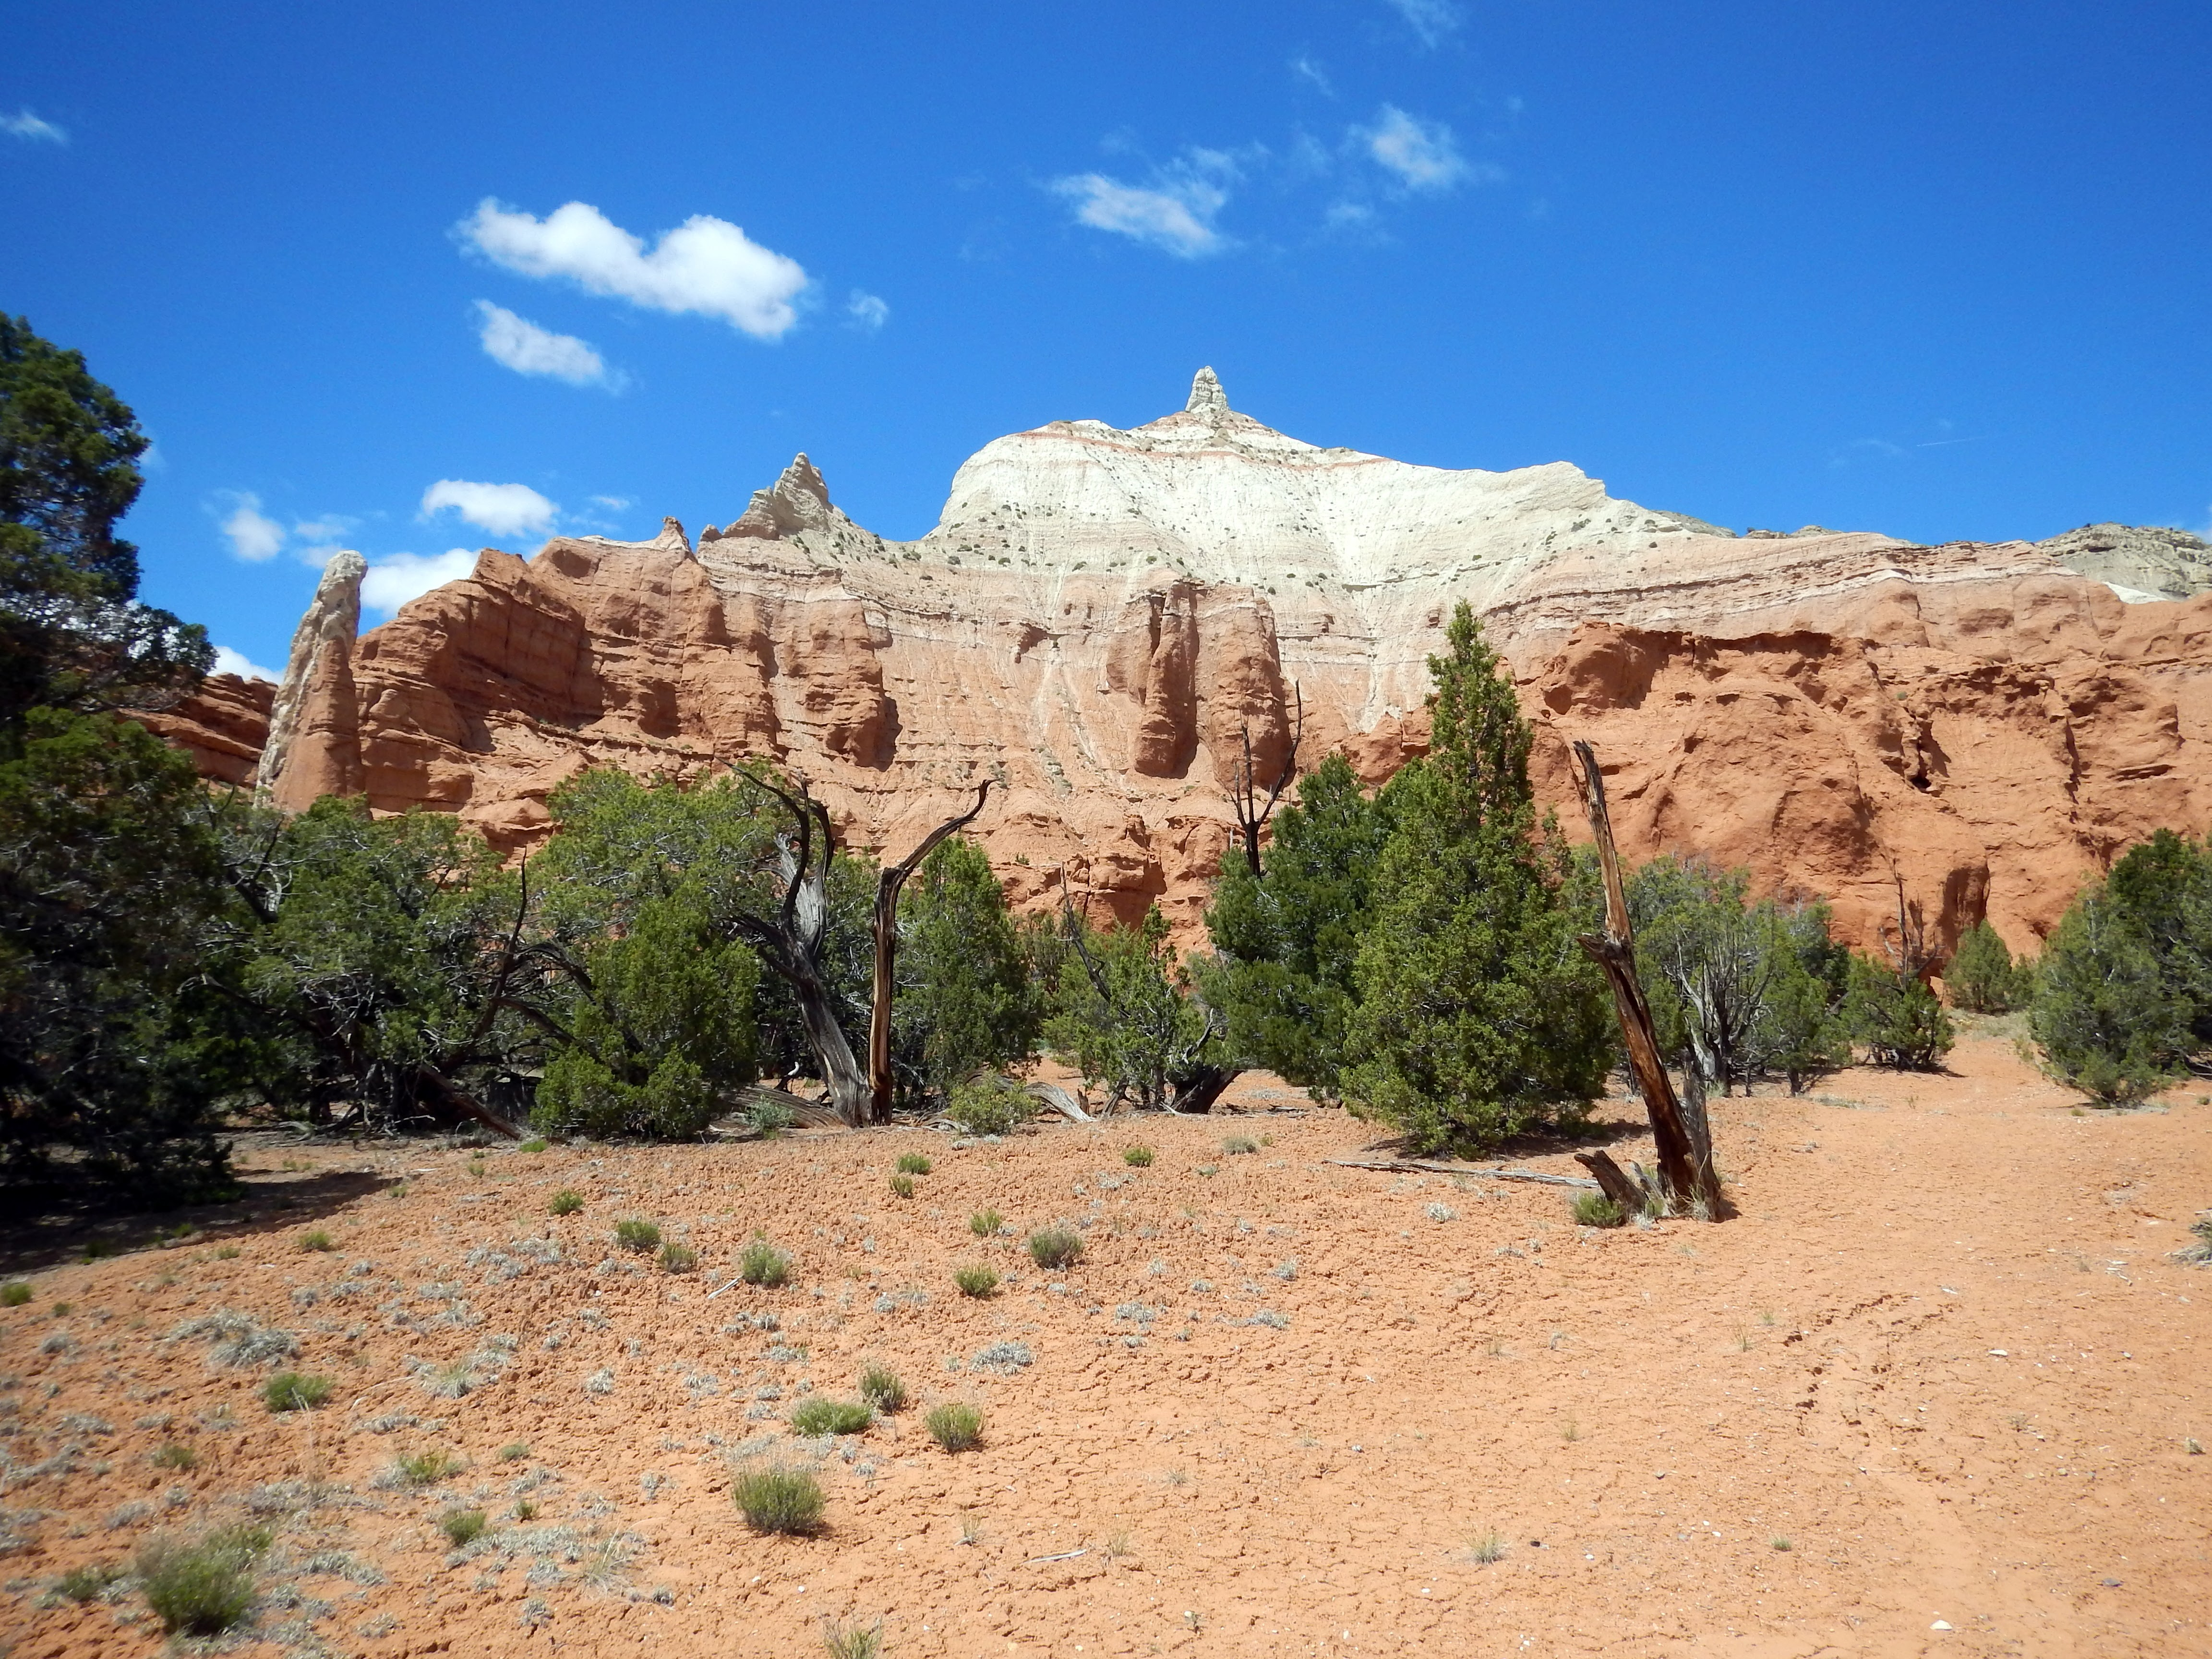 Photo: Park sampler: cryptobiotic crust, juniper trees, chimneys, and colorful rock layers.